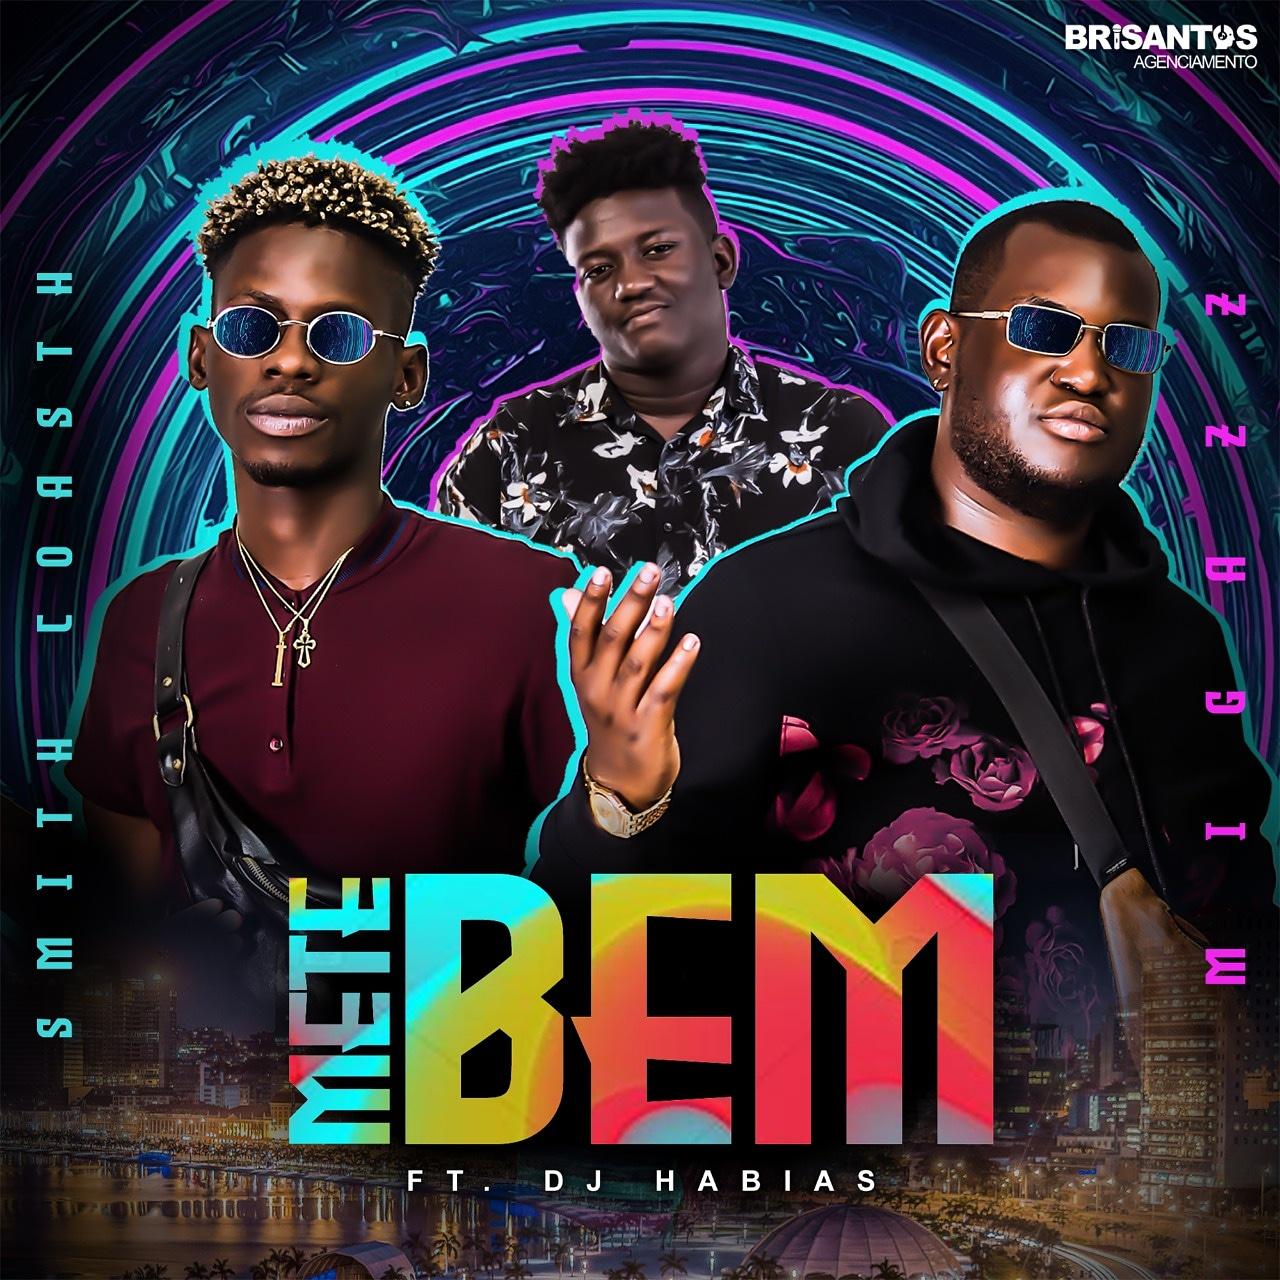 DOWNLOAD MP3 : Smith Coasth feat. Migazz & DJ Habias - Mete Bem (Afro House)(2020) - BEIRA9DADES ...